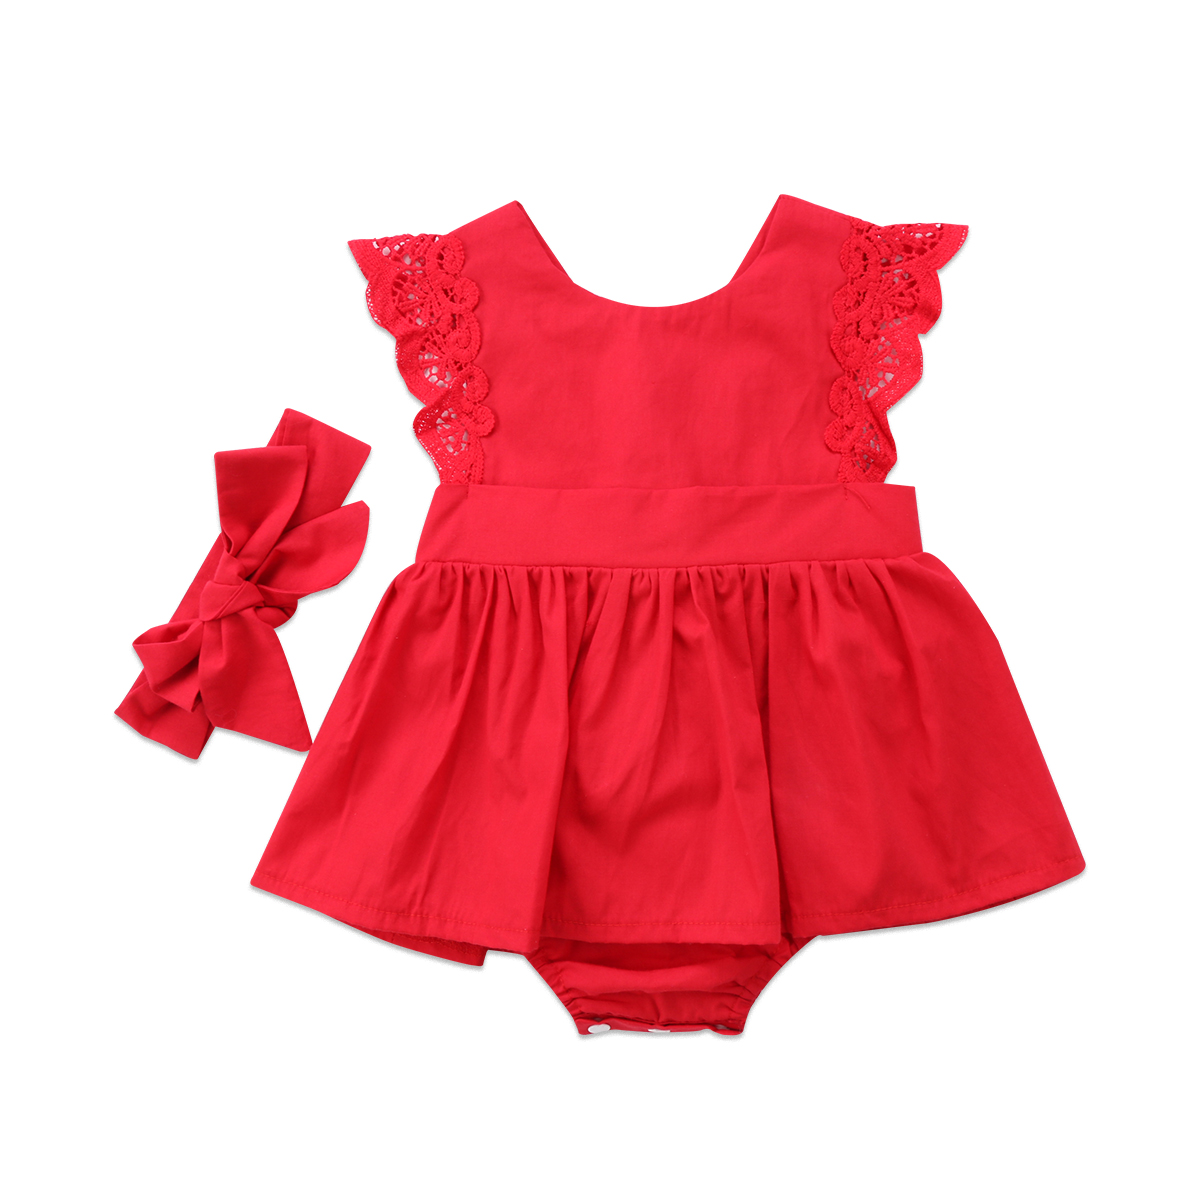 2Pcs Newborn Infant Baby Girl 0-24M Lace Romper Dress Jumpsuit Outfit Clothes Headband